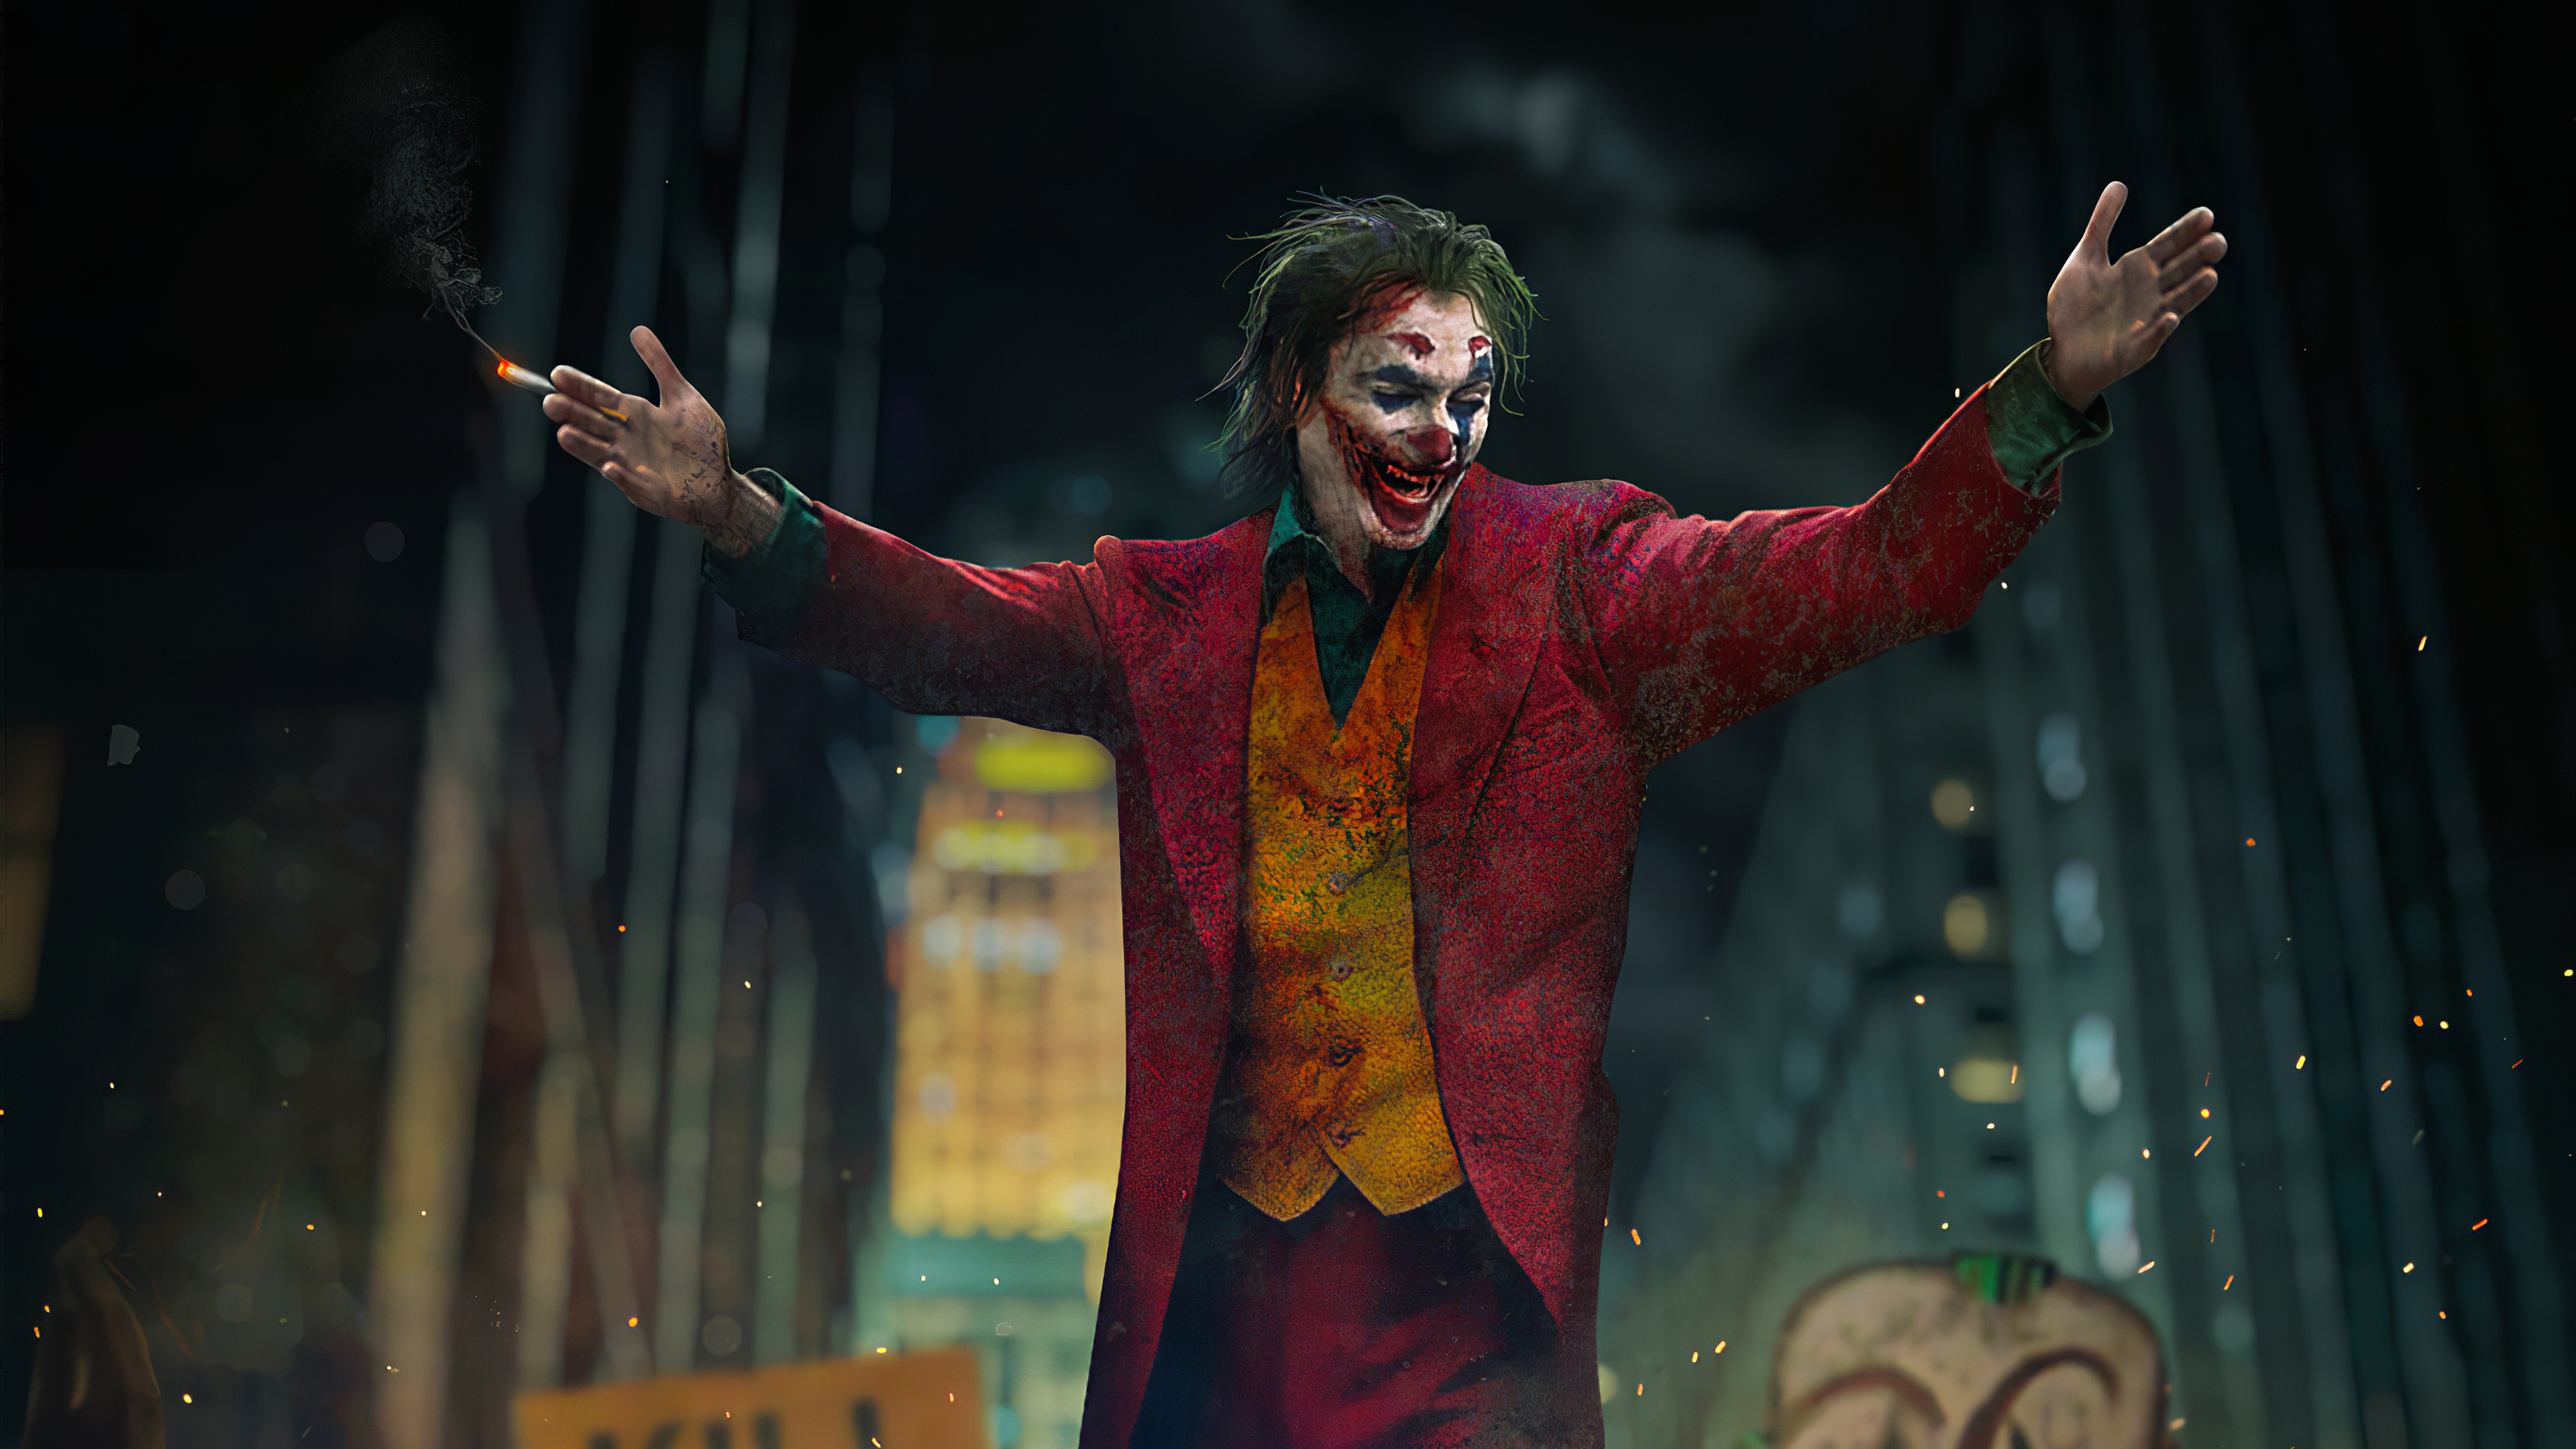 joker-all-come-wc.jpg